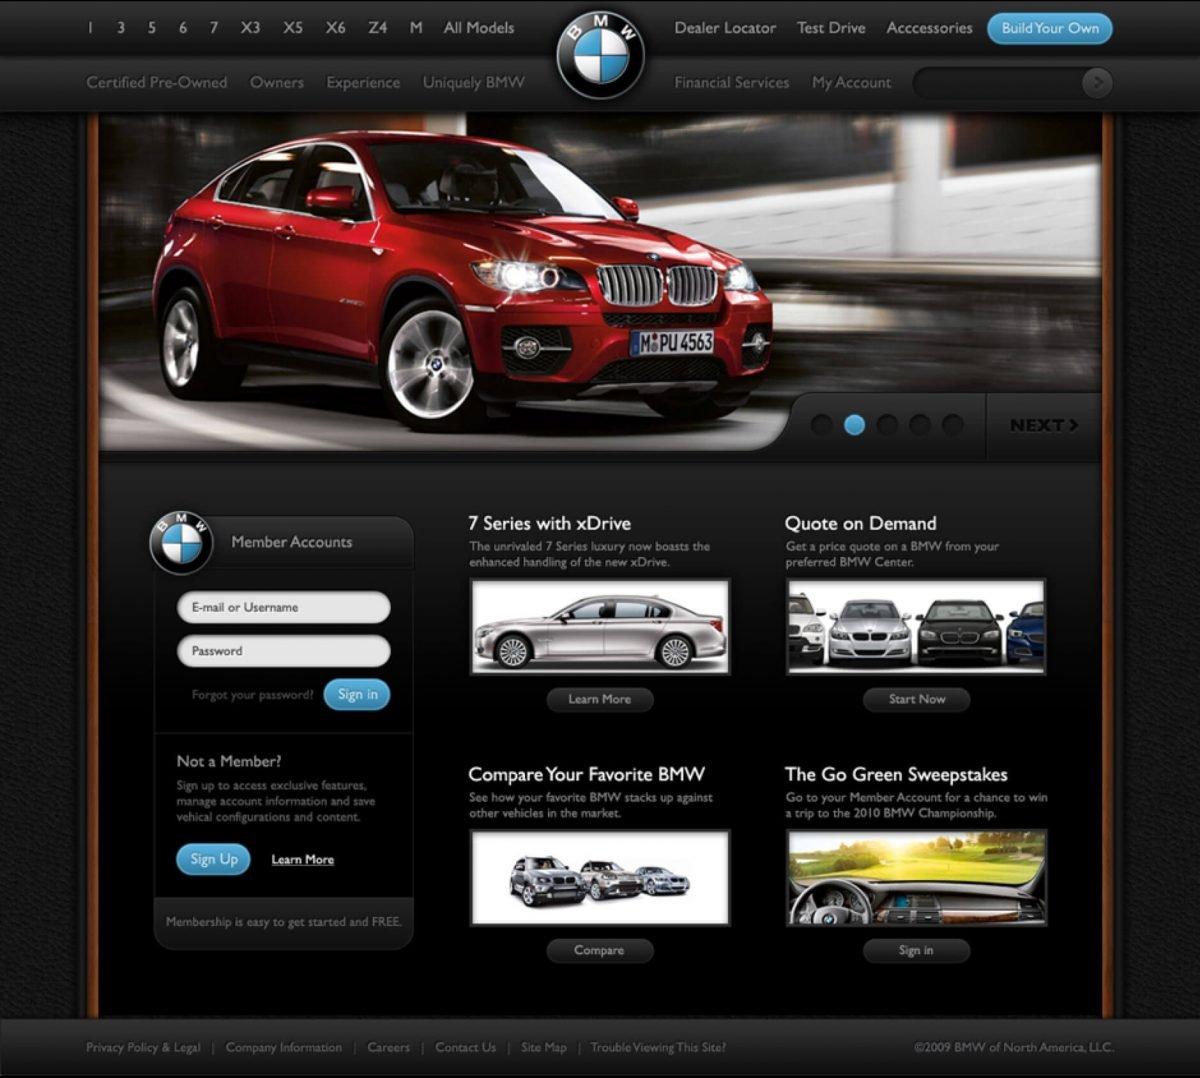 Ryan Scherf proposed redesign for BMW website